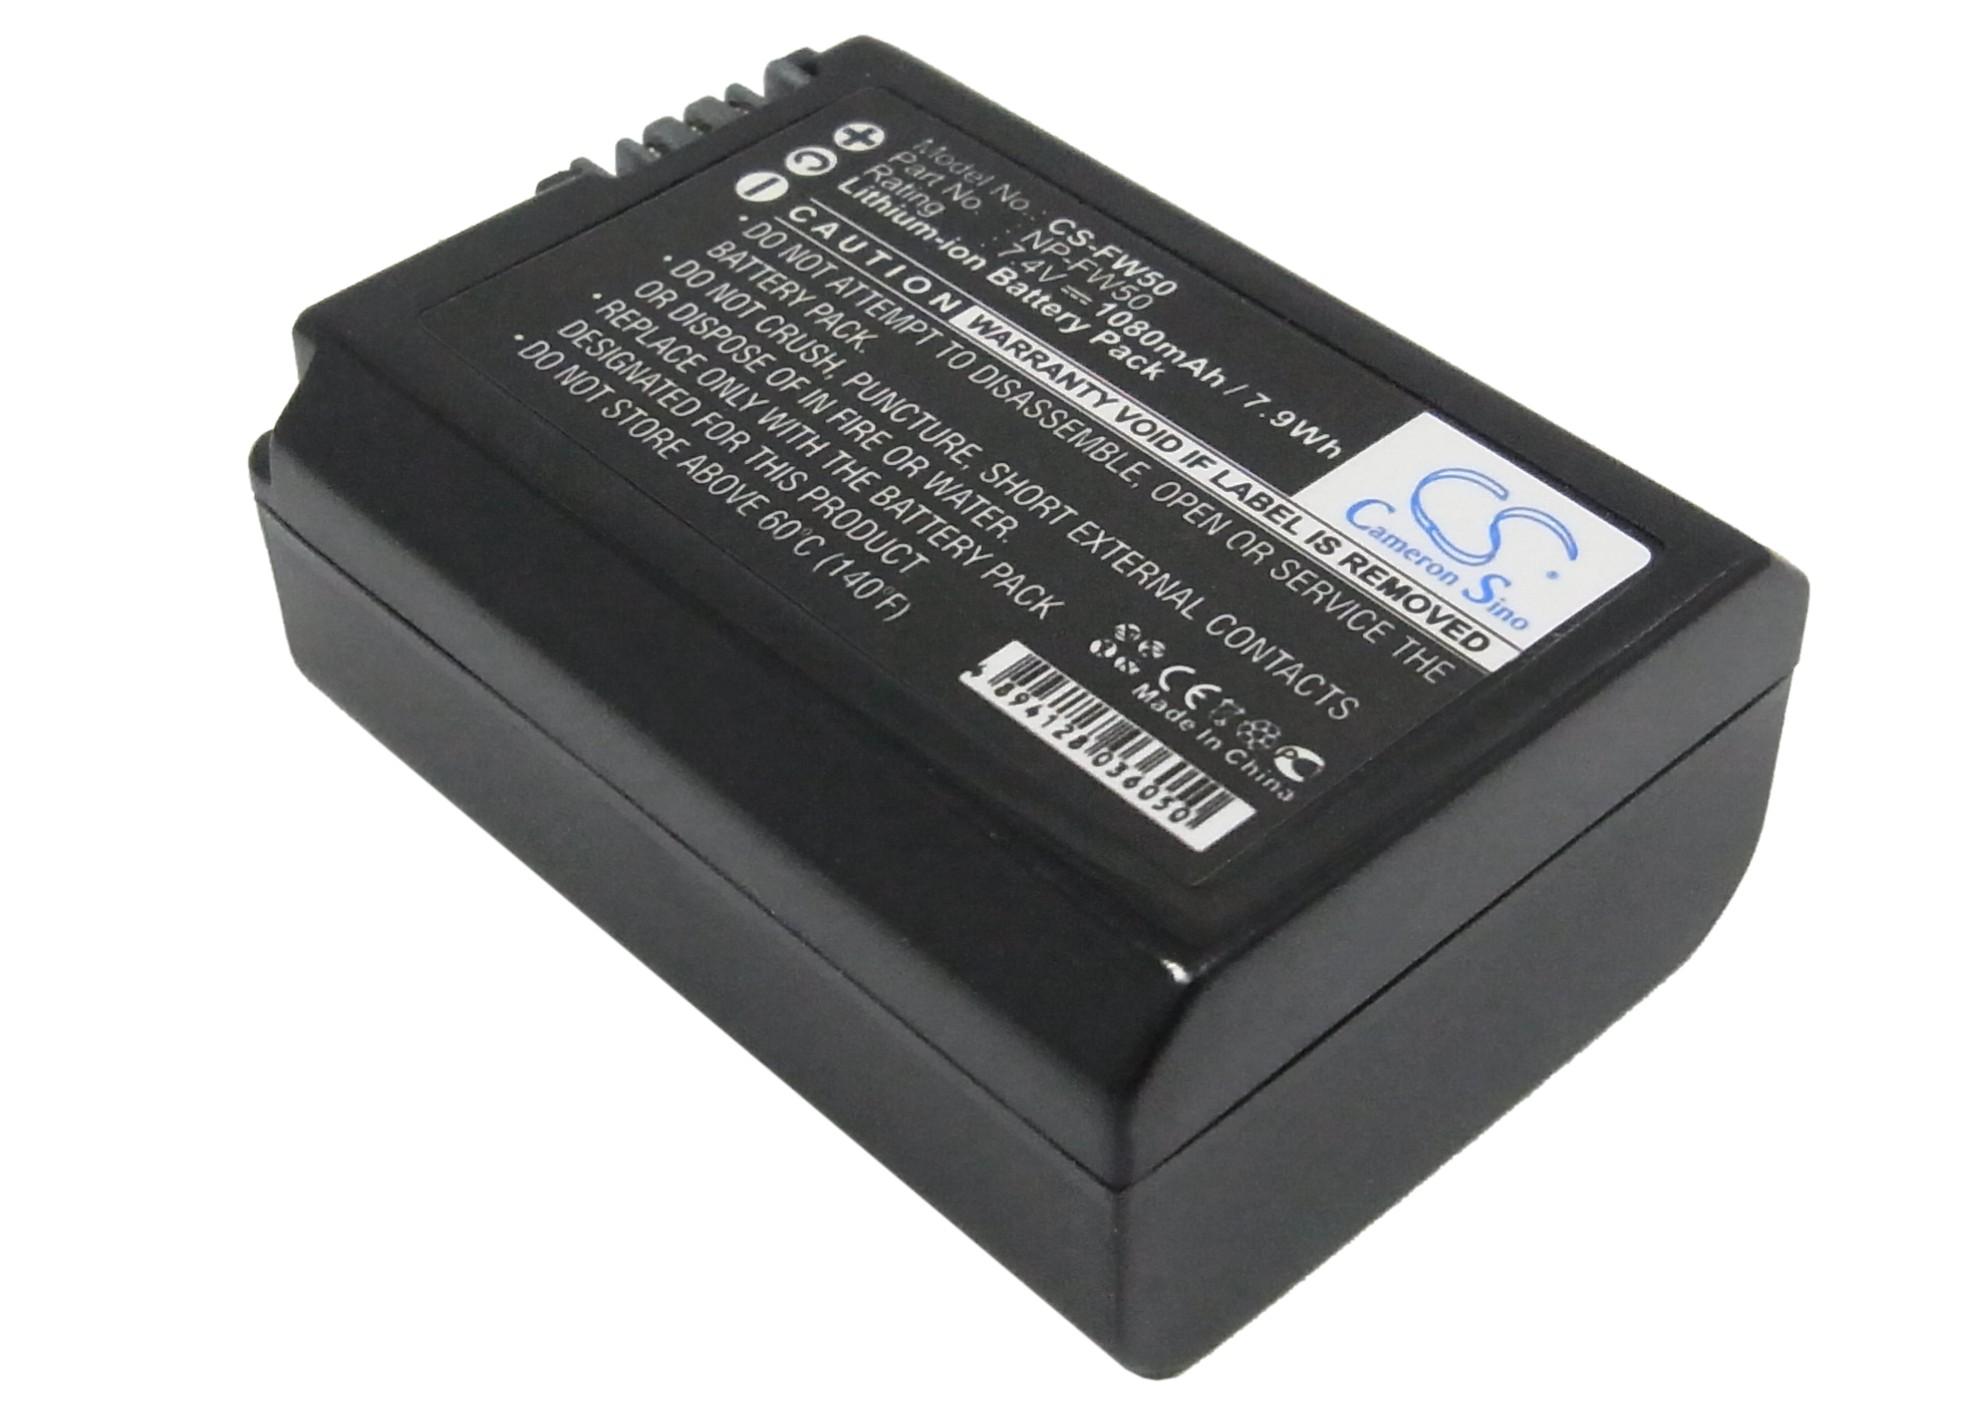 Cameron Sino baterie do kamer a fotoaparátů pro SONY Mirrorless Alpha A5000 7.4V Li-ion 1080mAh černá - neoriginální